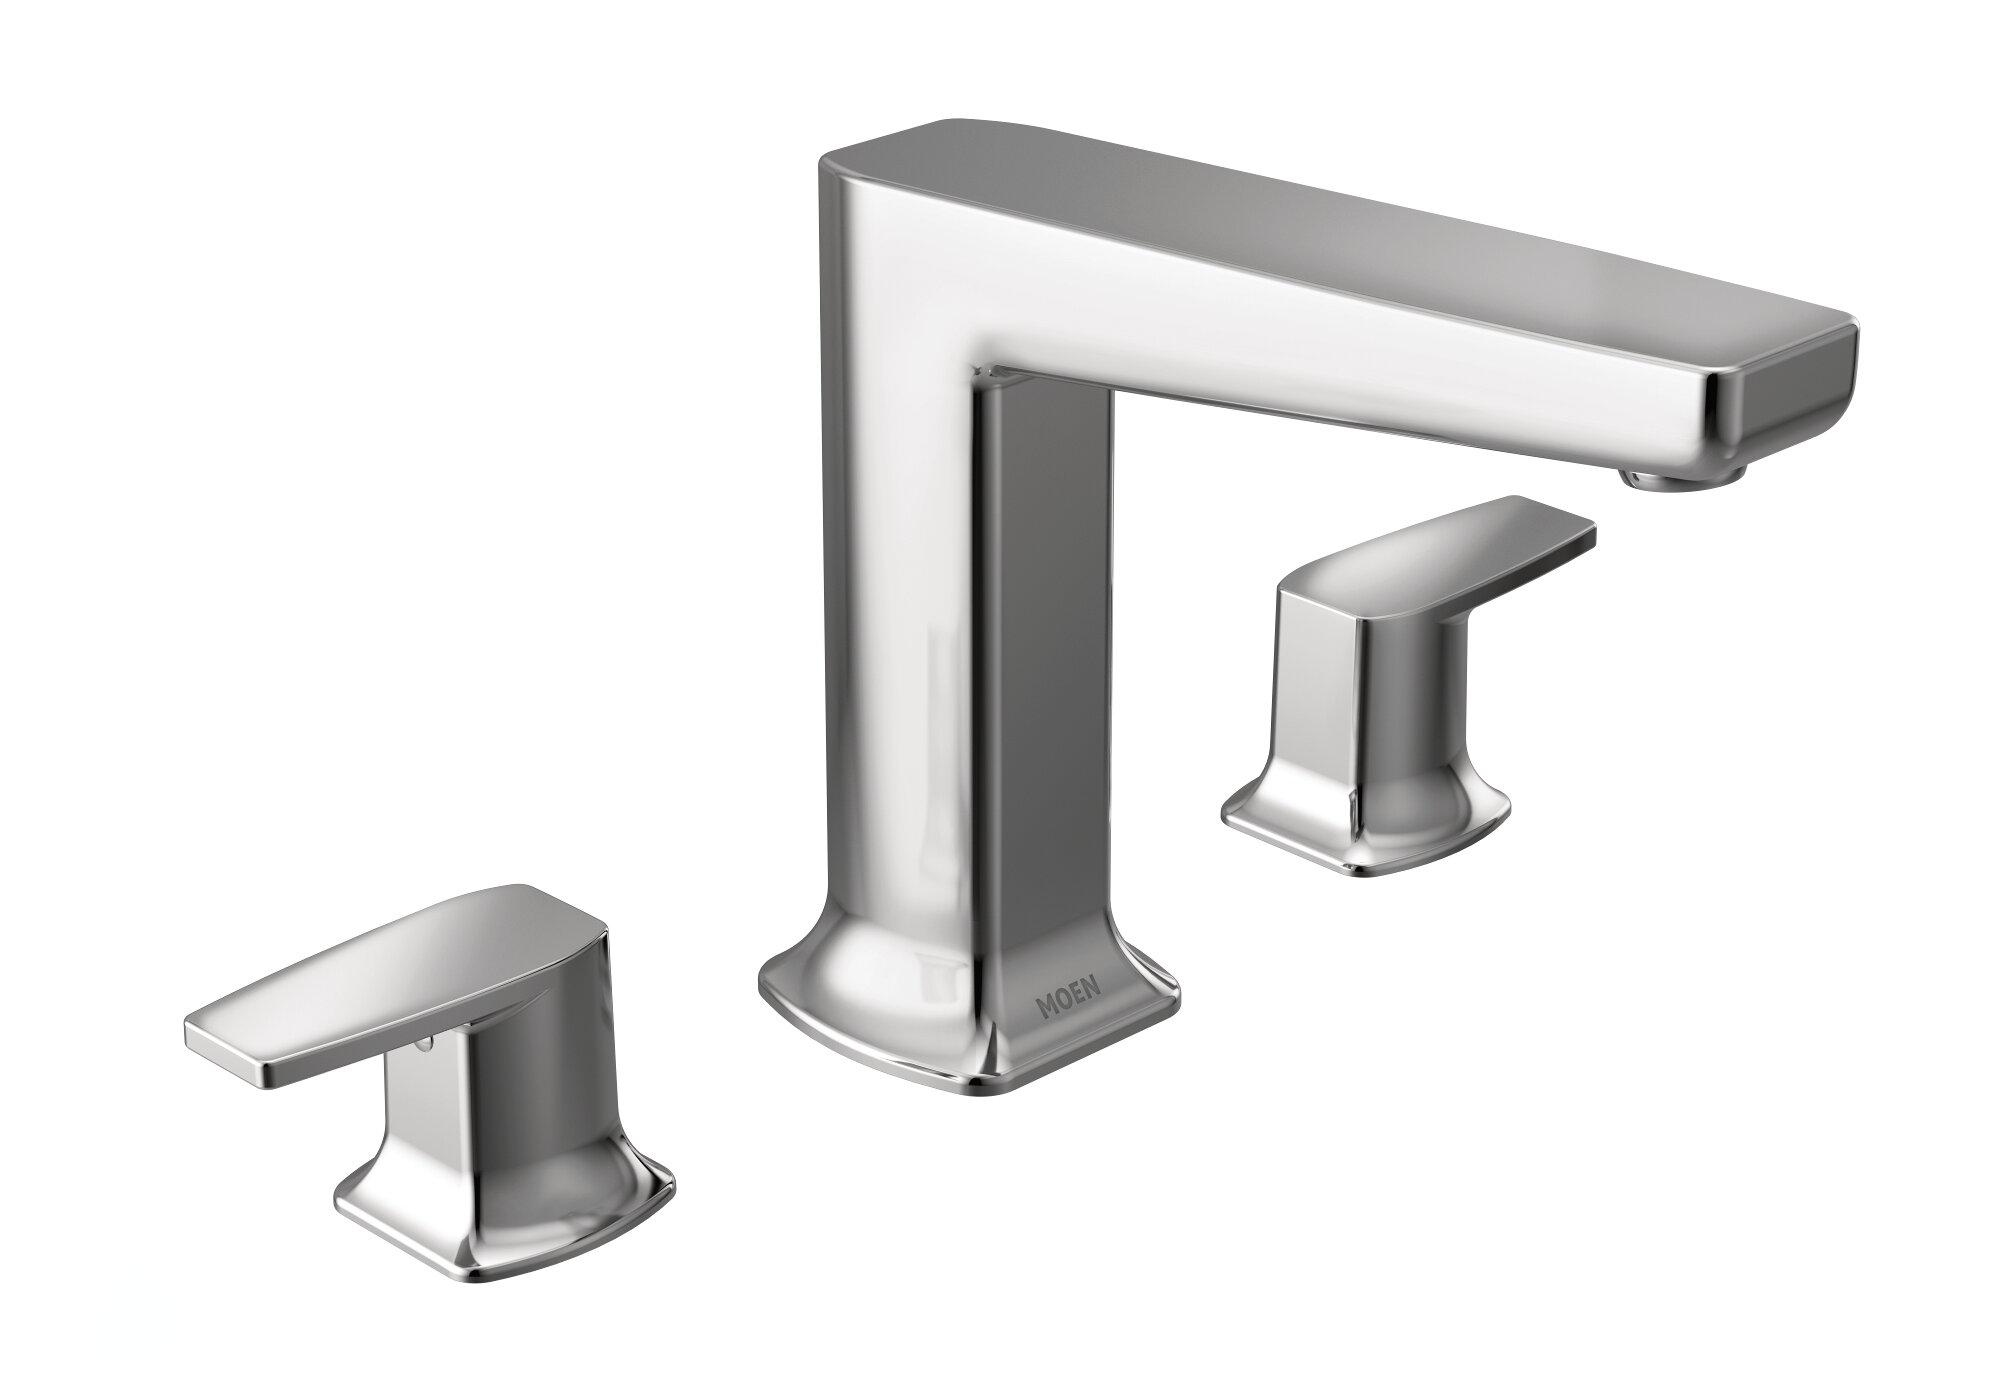 Via 2 Handle Deck Mounted Roman Tub Faucet Trim